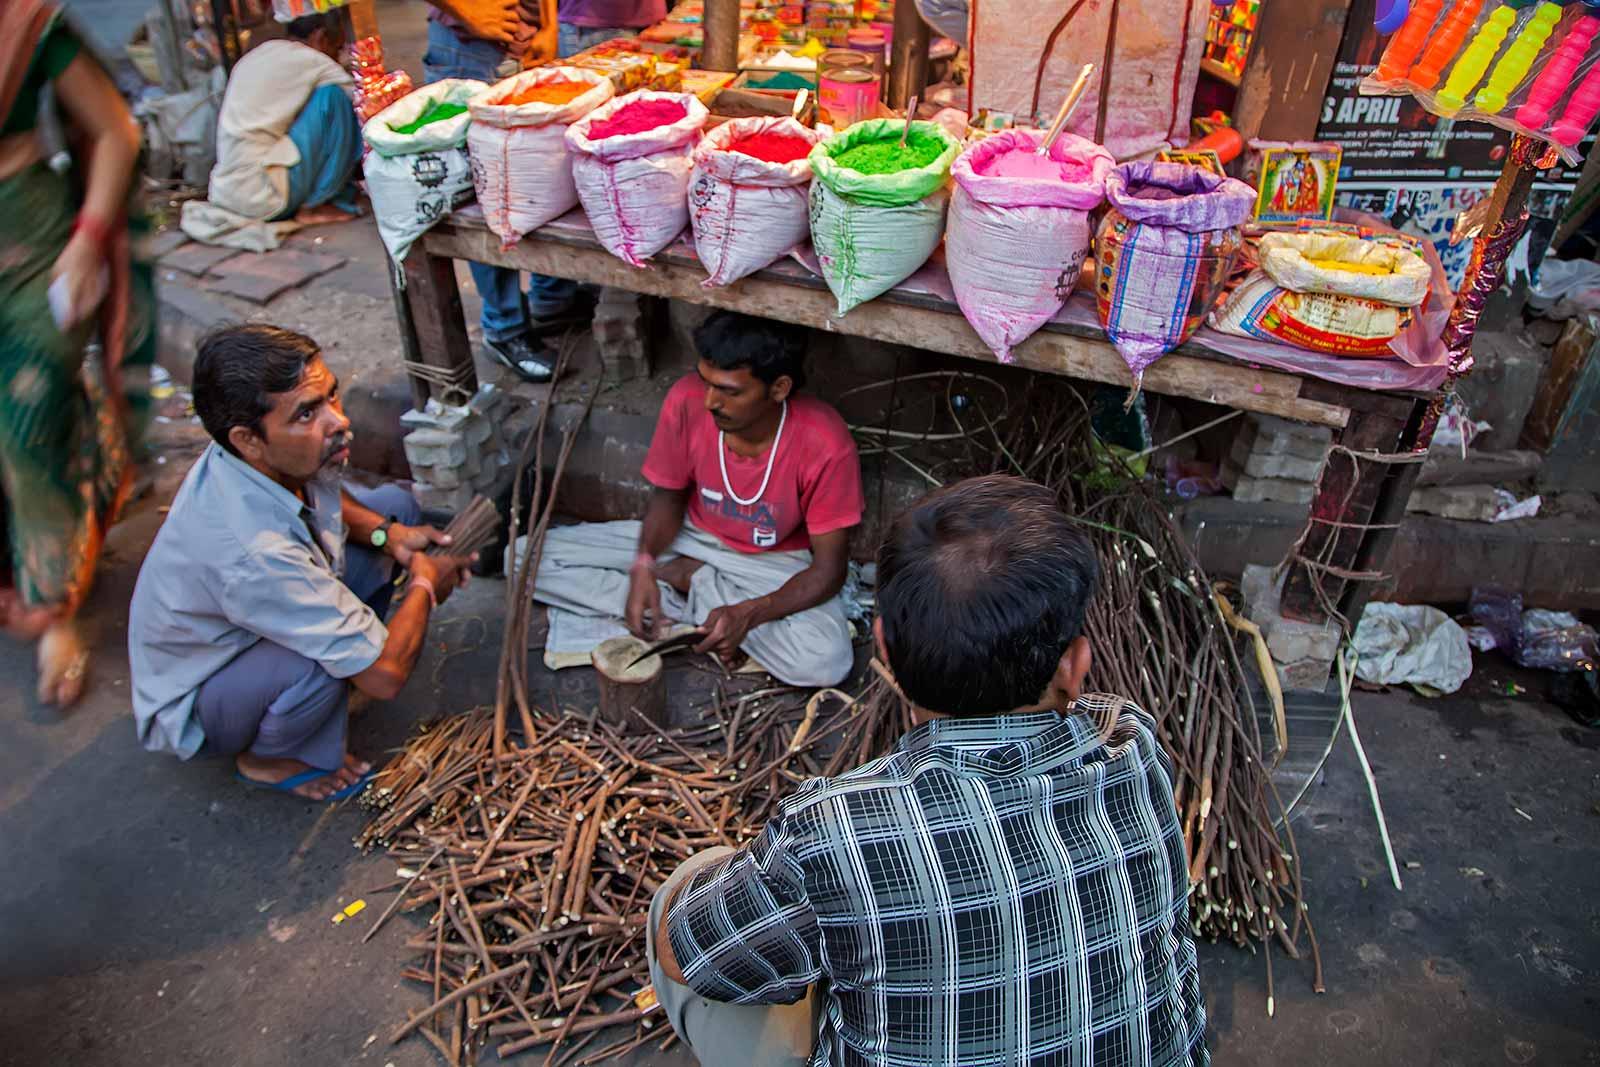 getting-ready-for-holi-festival-kolkata-india-2